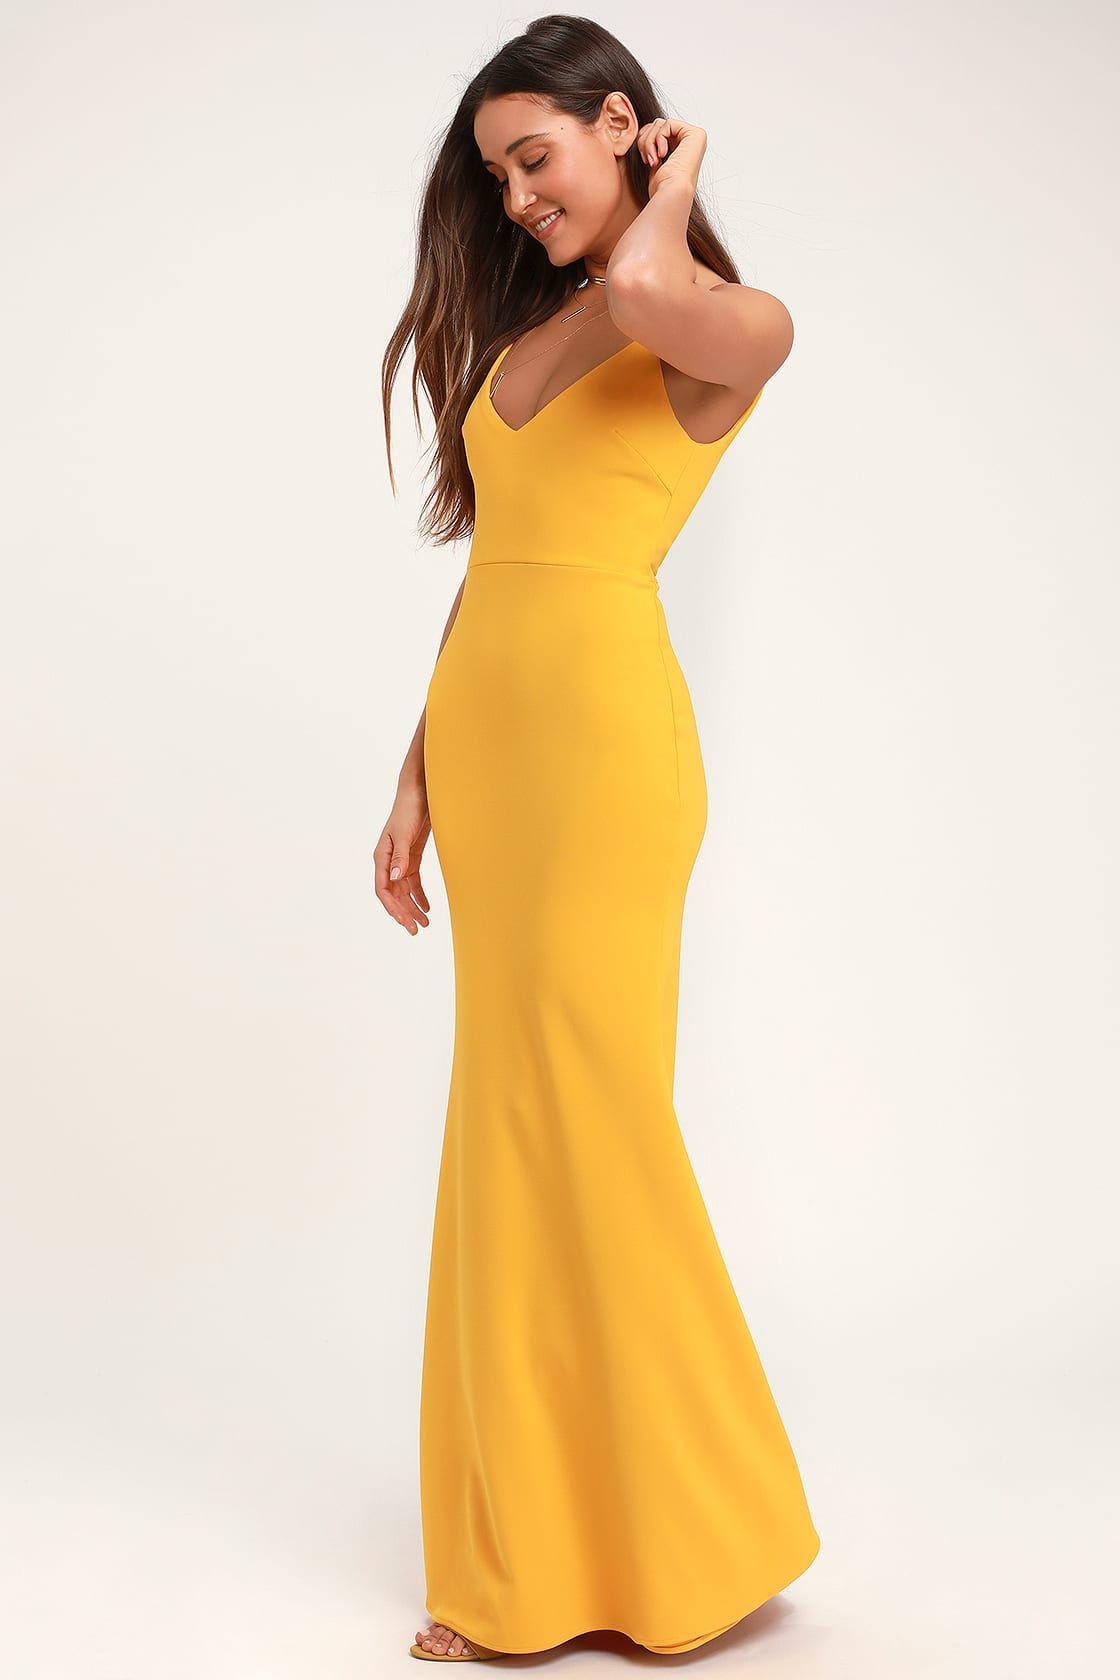 Infinite Glory Golden Yellow Maxi Dress in